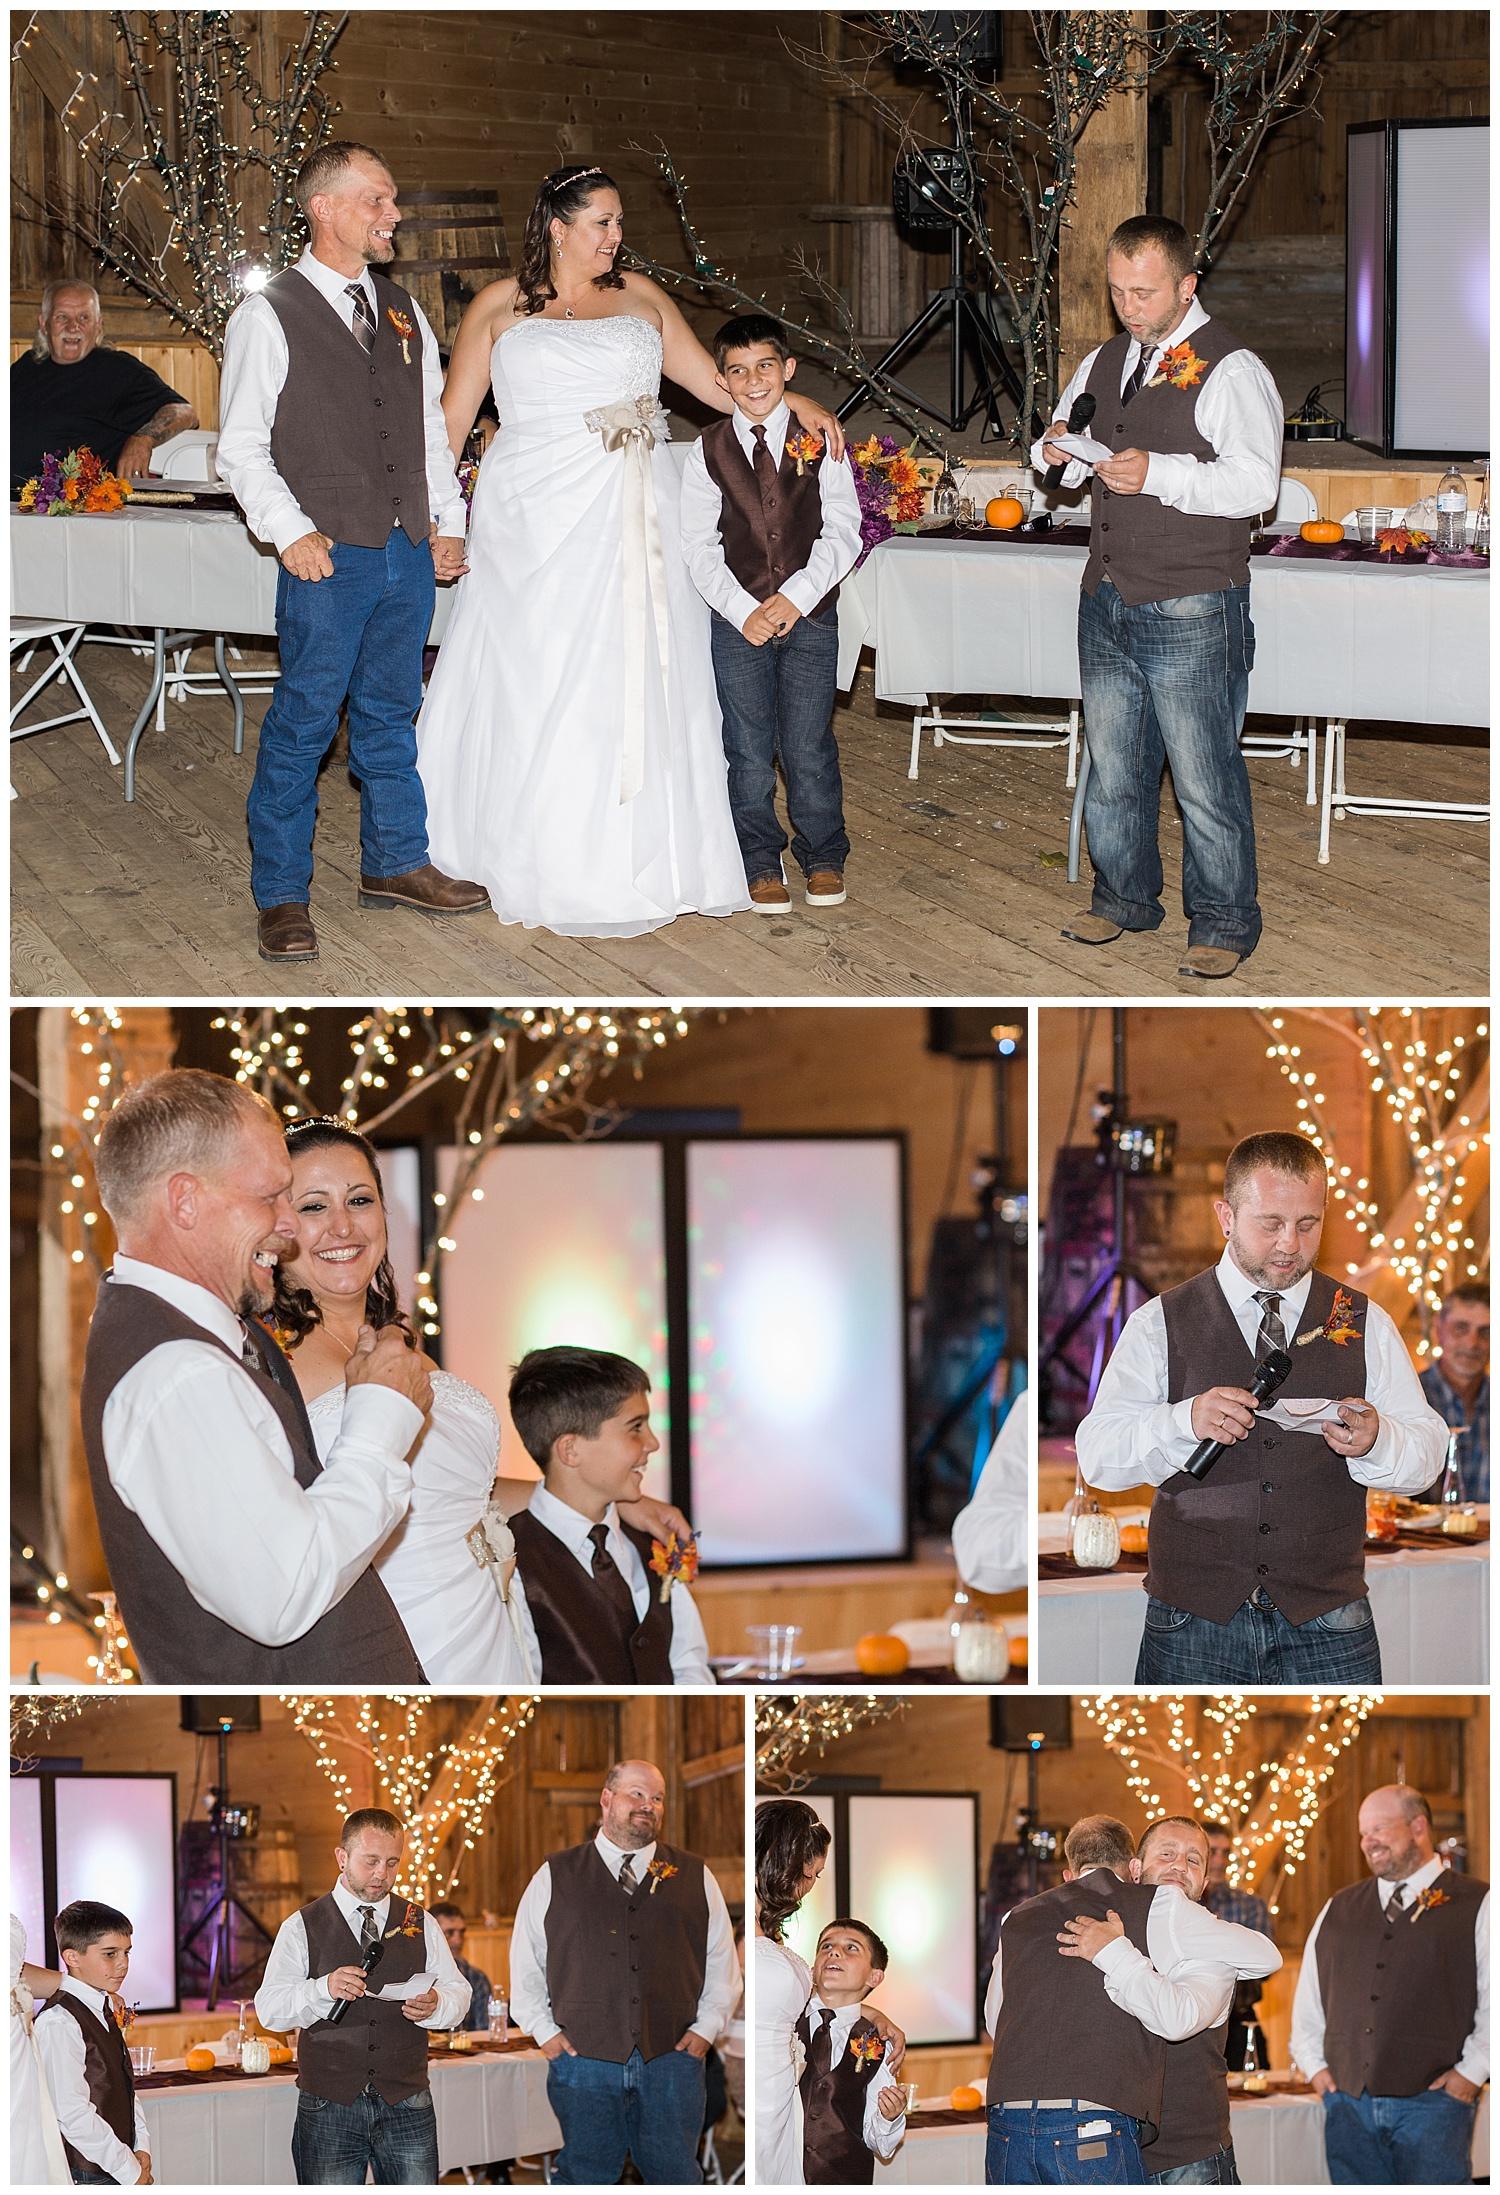 The Hall Wedding - York NY - Lass and Beau-1010_Buffalo wedding photography.jpg